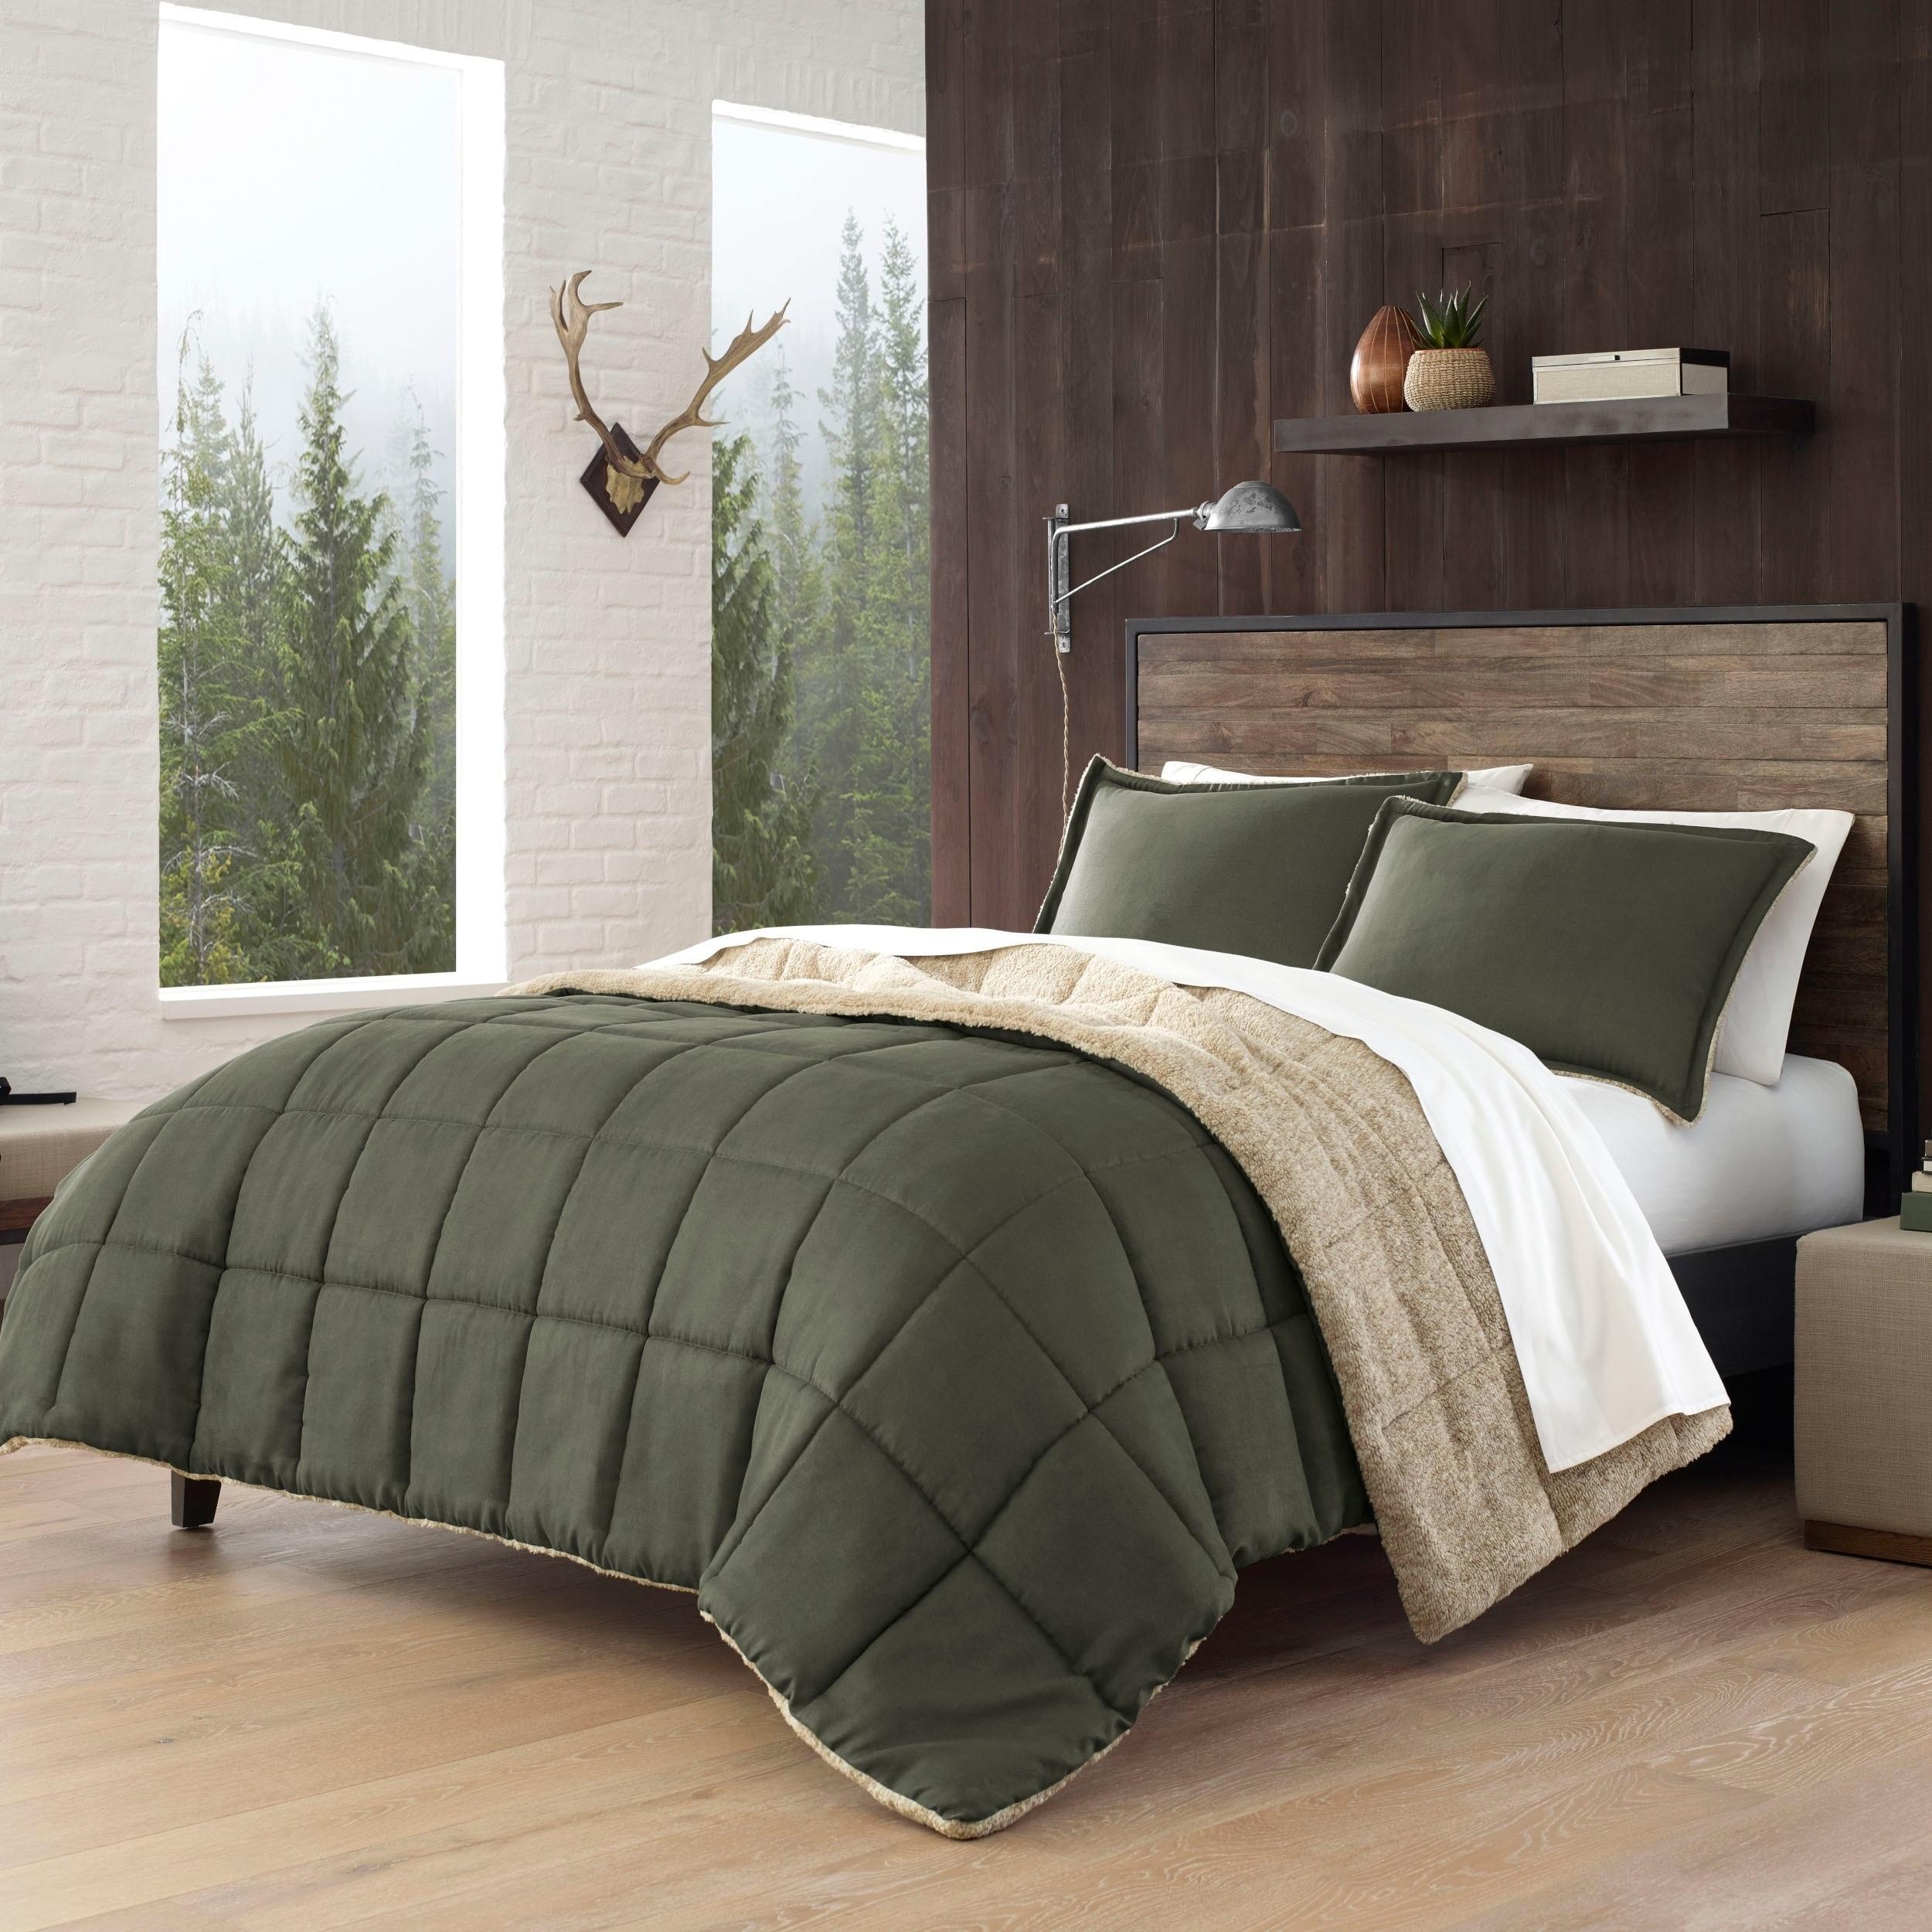 Eddie Bauer Sherwood Green Comforter Set Overstock 28639693